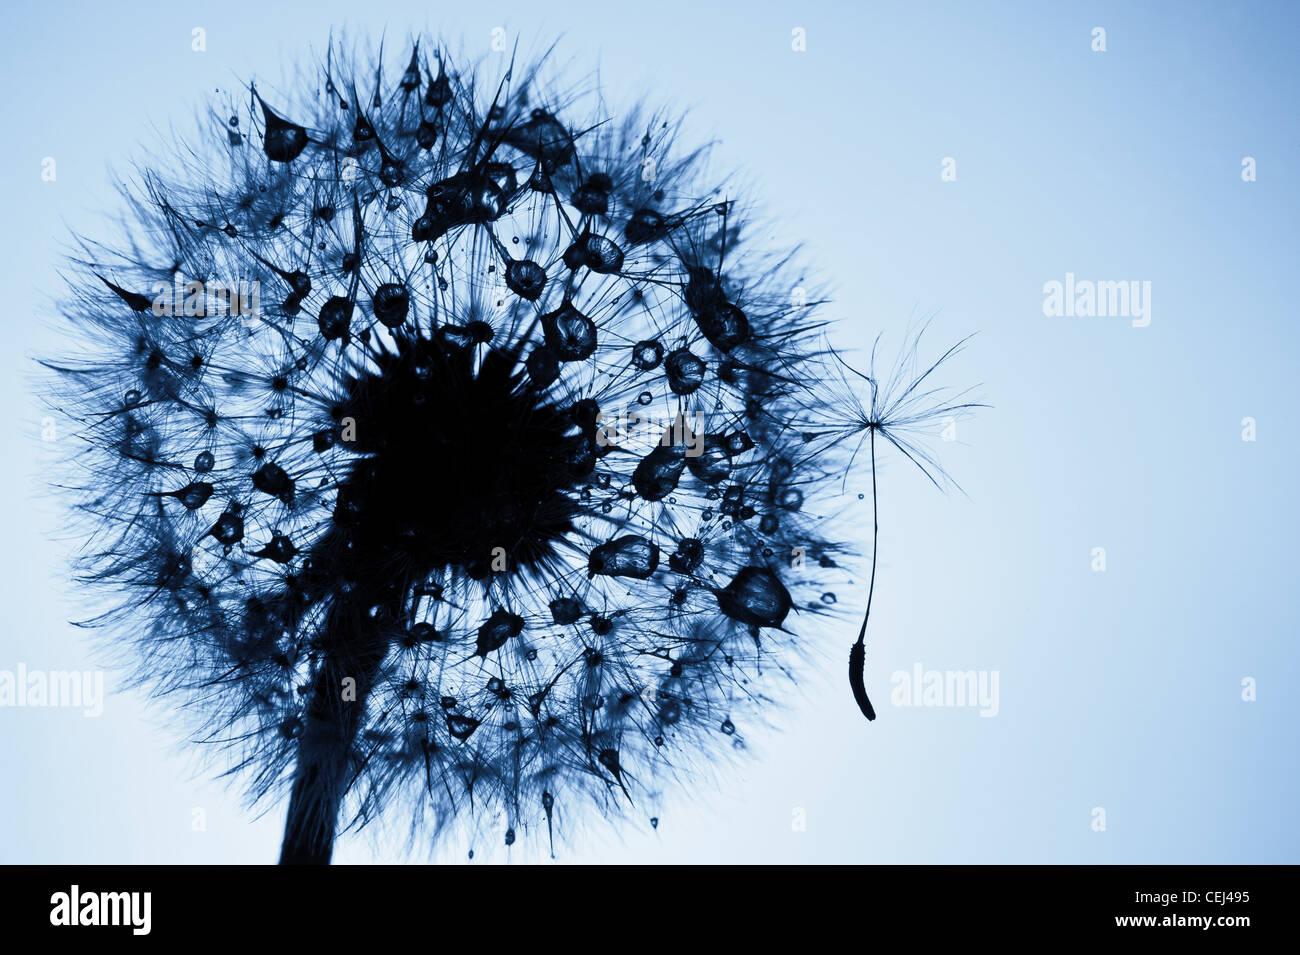 Dandelion - Stock Image